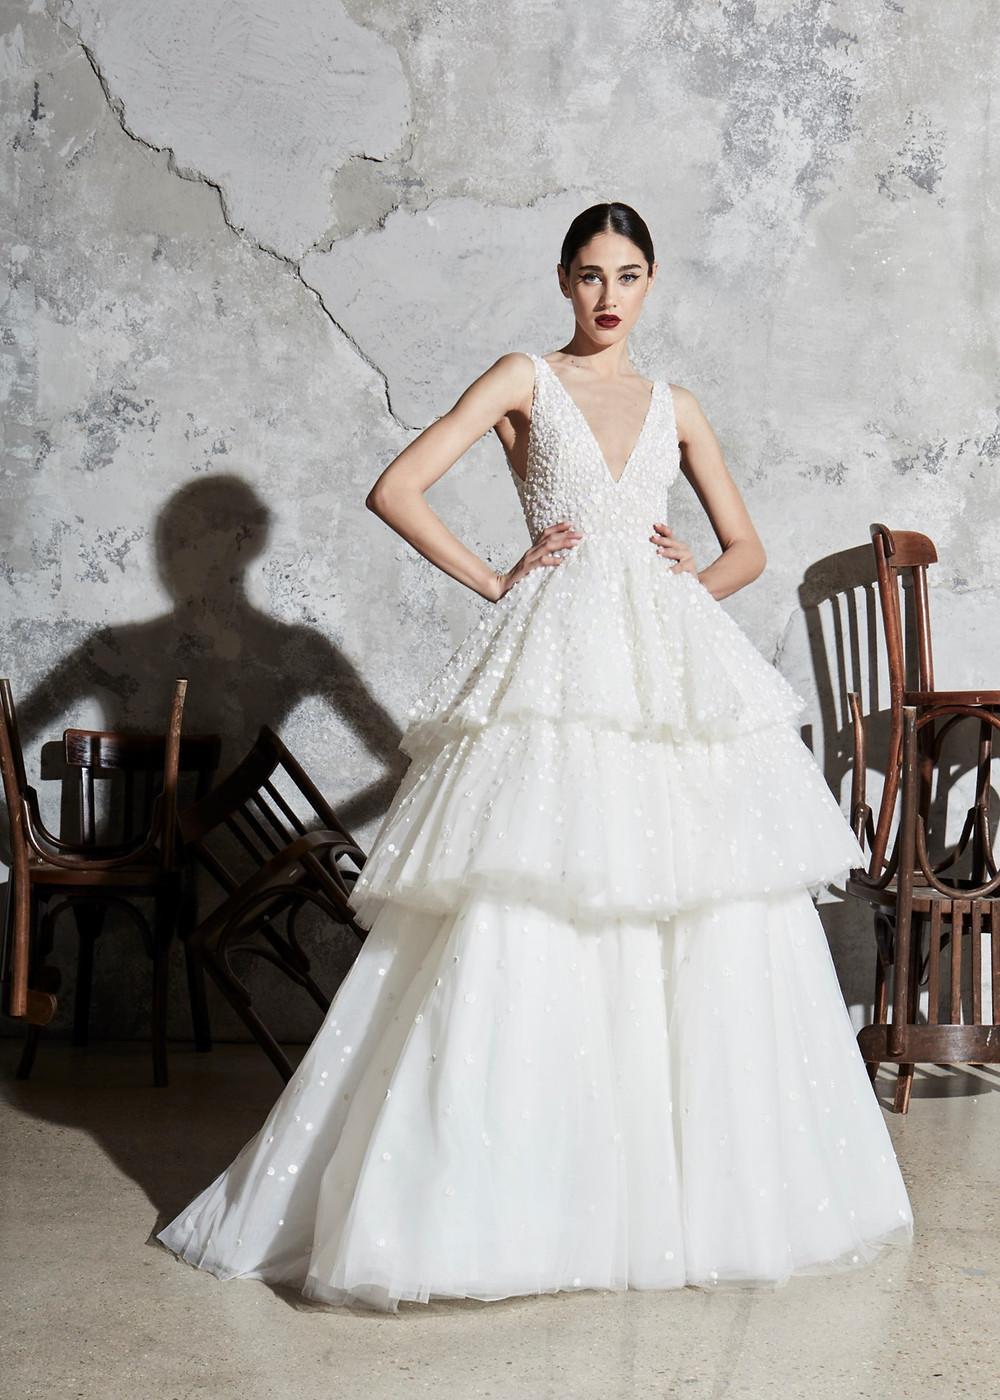 A Zuhair Murad ball gown wedding dress with a layered skirt, a deep v neckline and pearls